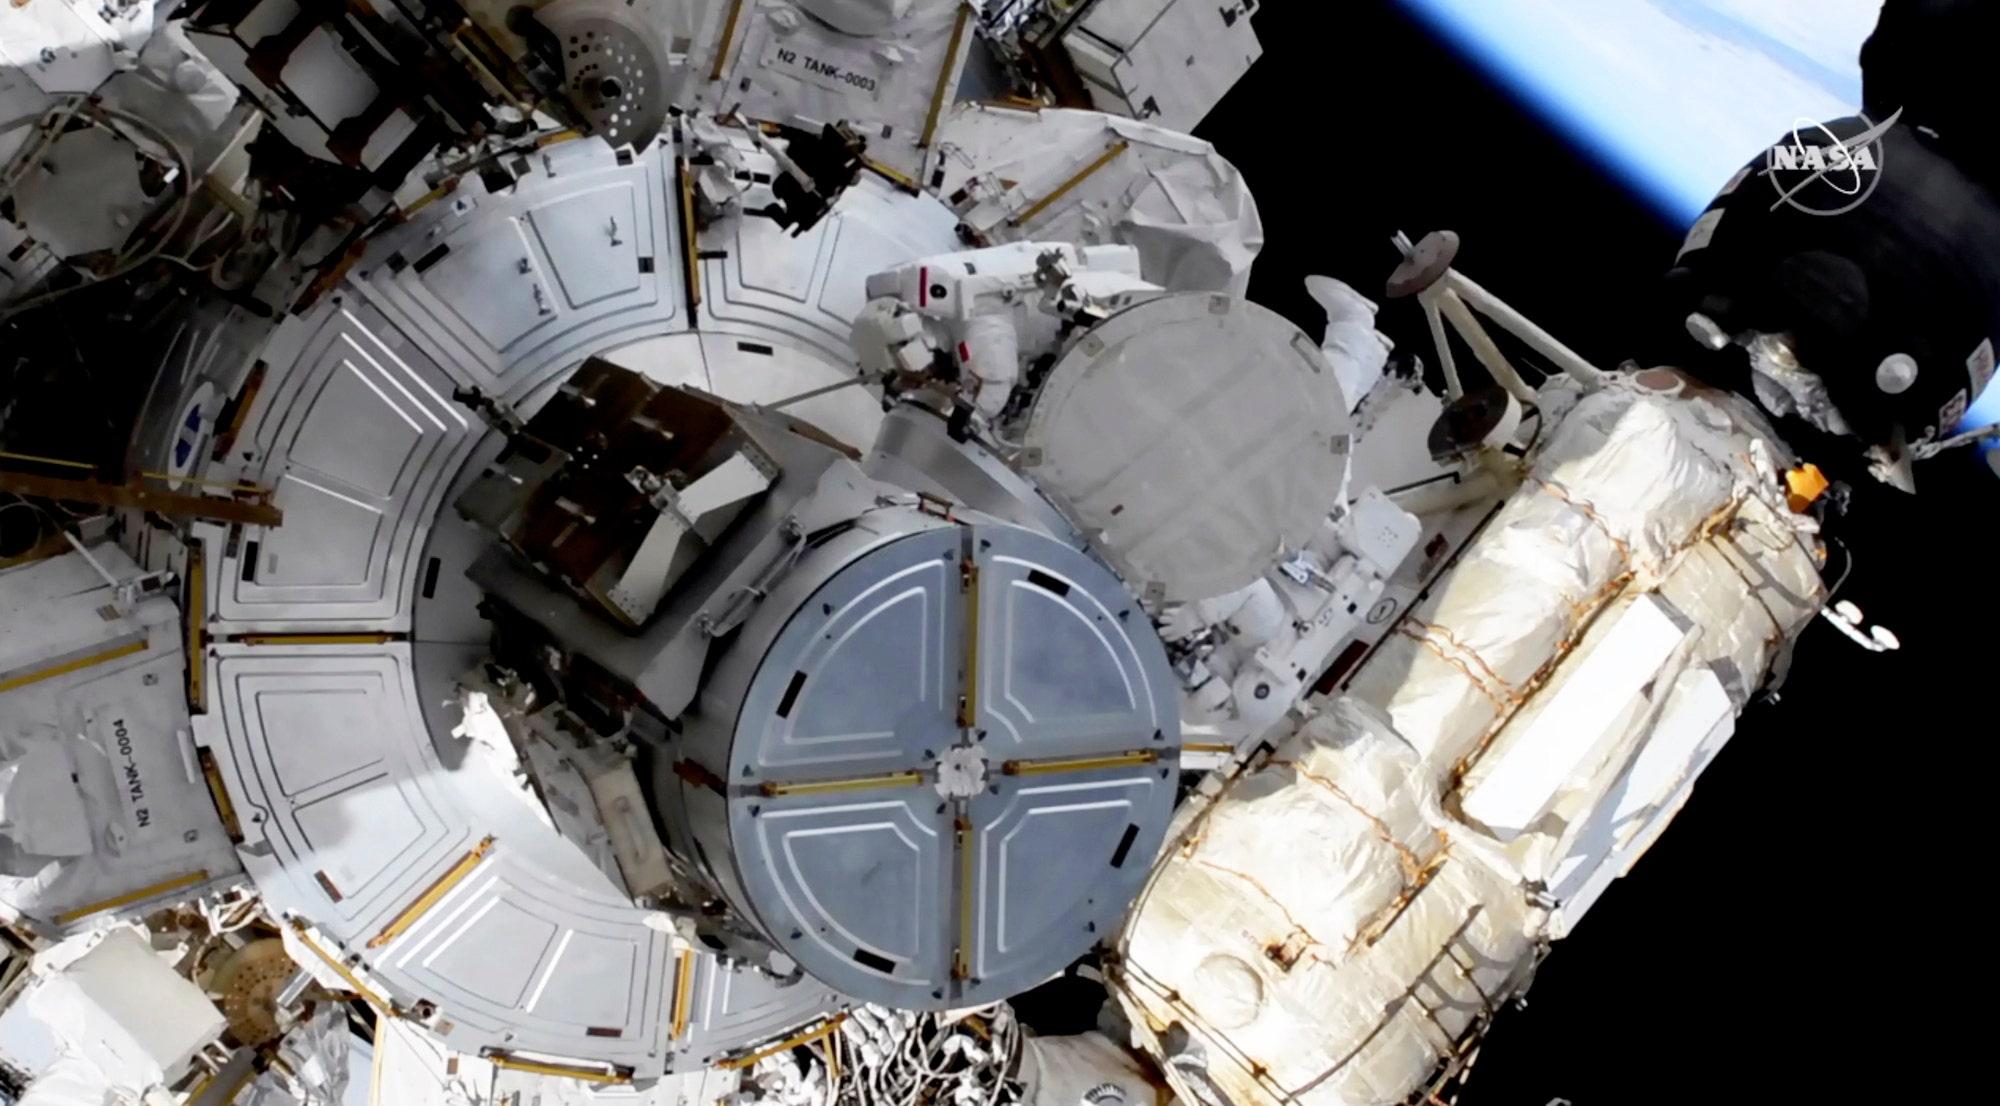 Spacewalking astronauts boosting station's solar power